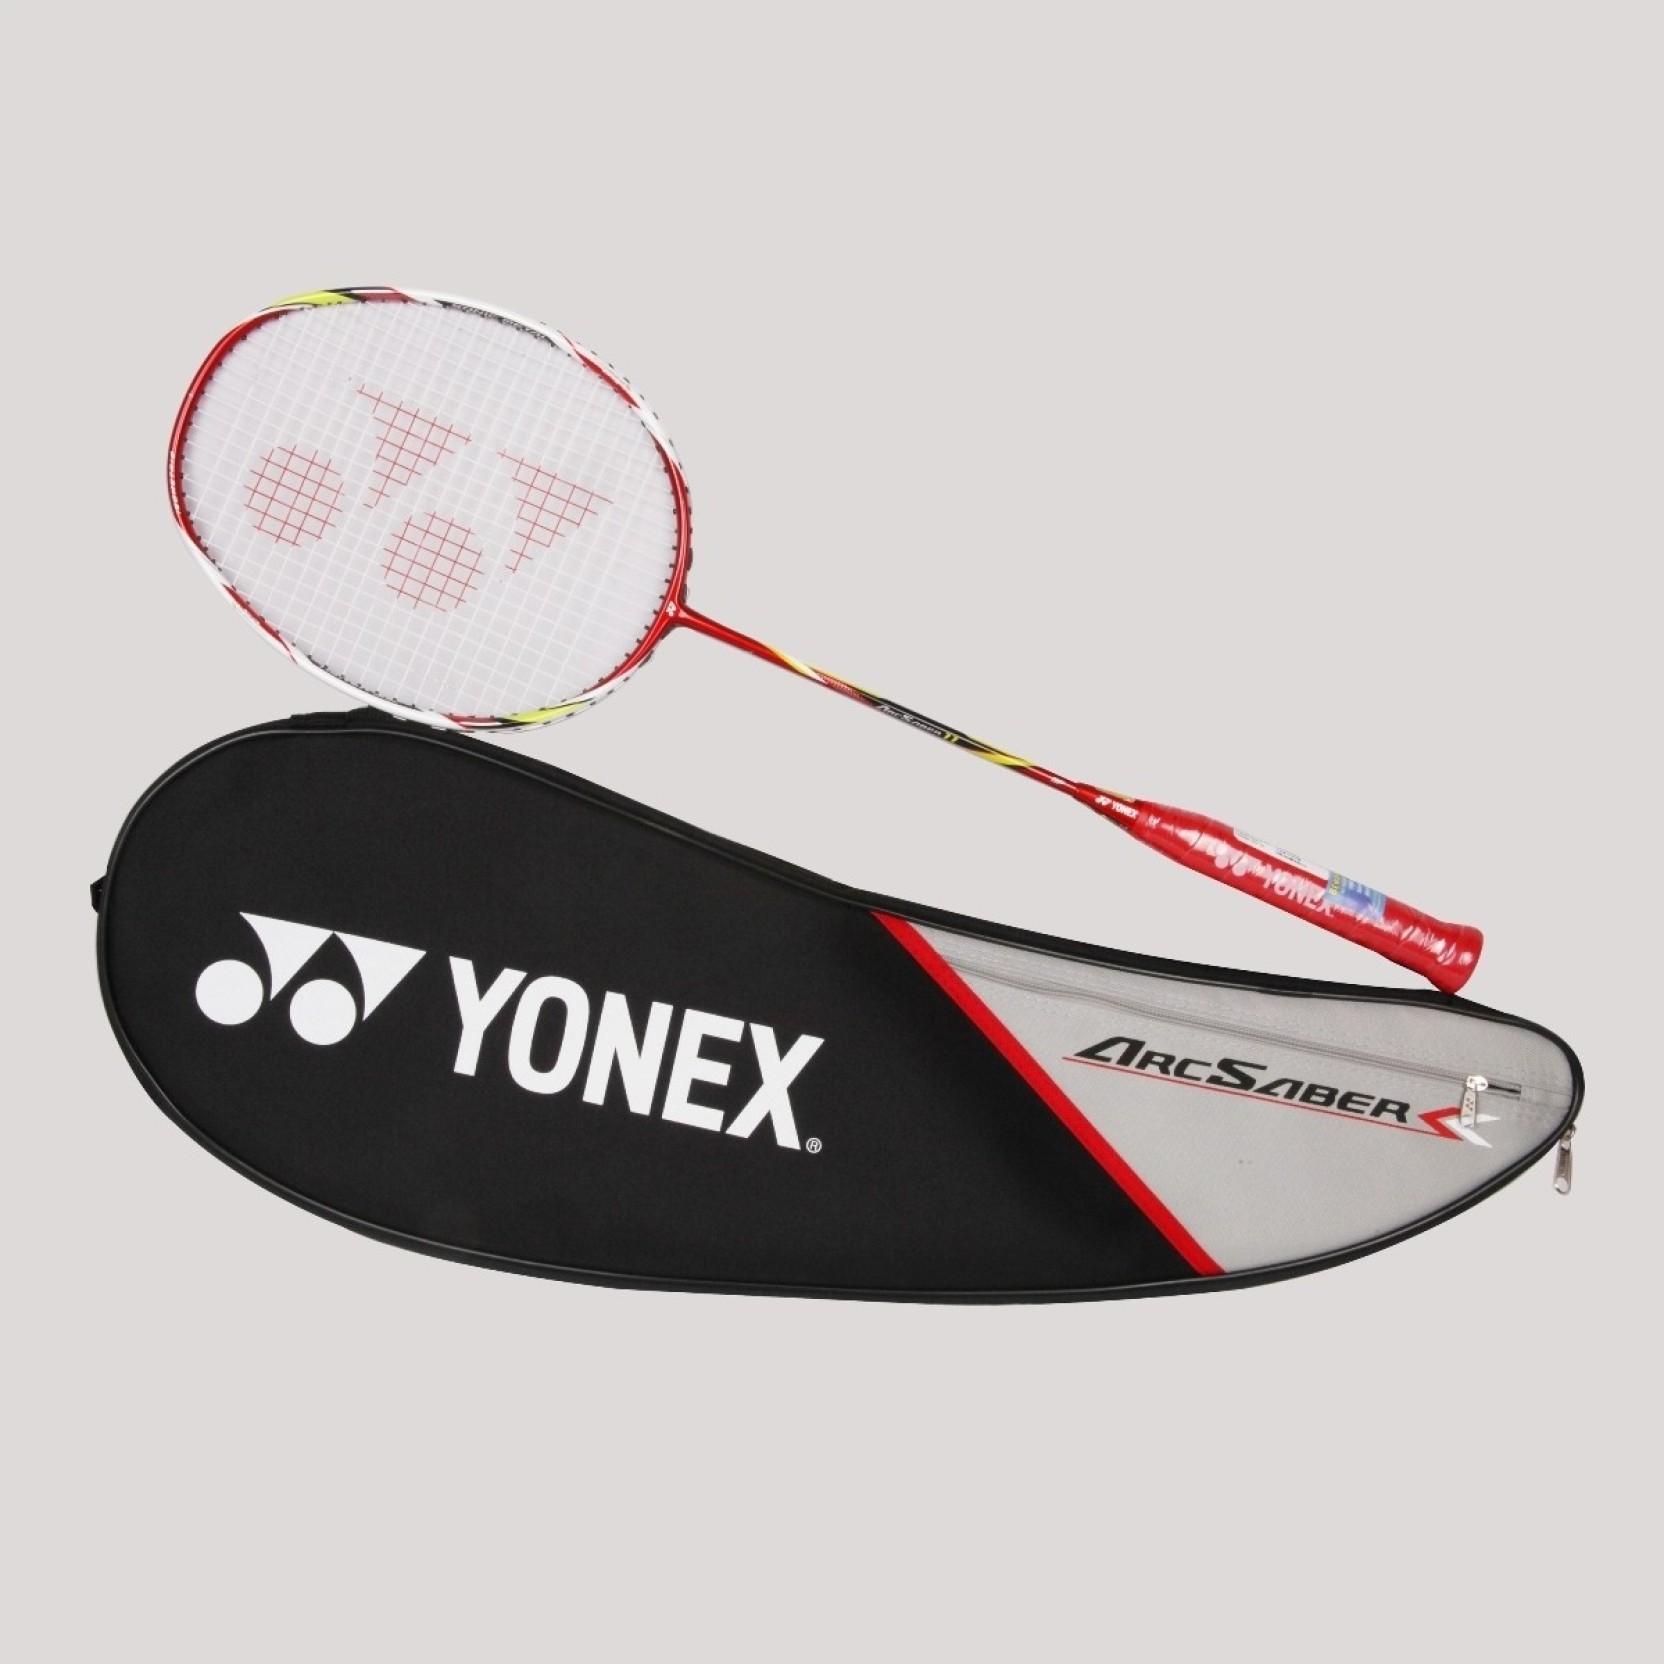 Yonex Arcsaber 11 G4 Unstrung - Buy Yonex Arcsaber 11 G4 ...